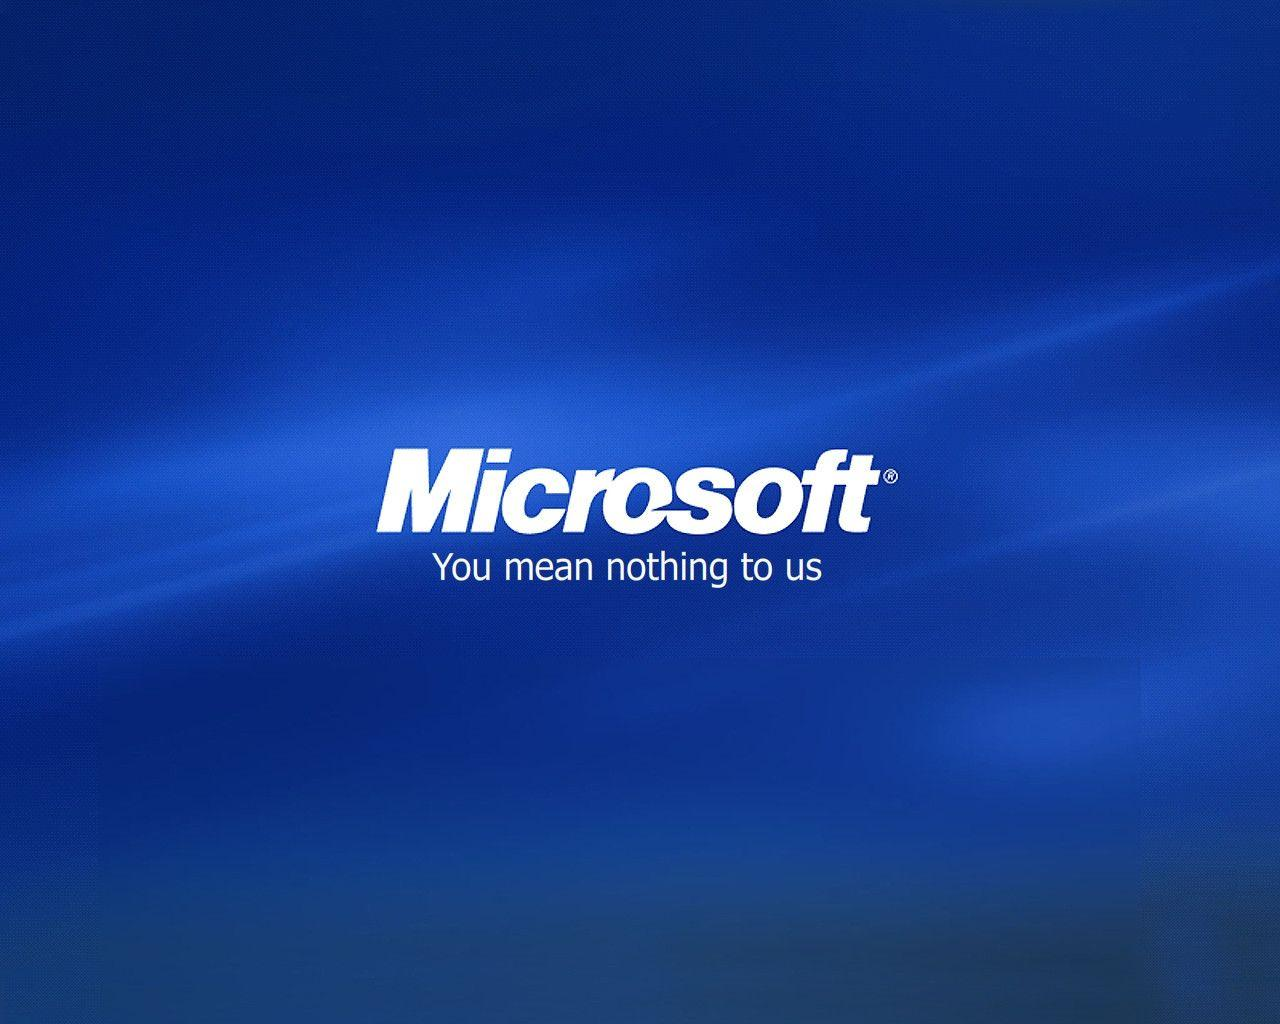 Wallpapers Microsoft - Wallpaper Cave